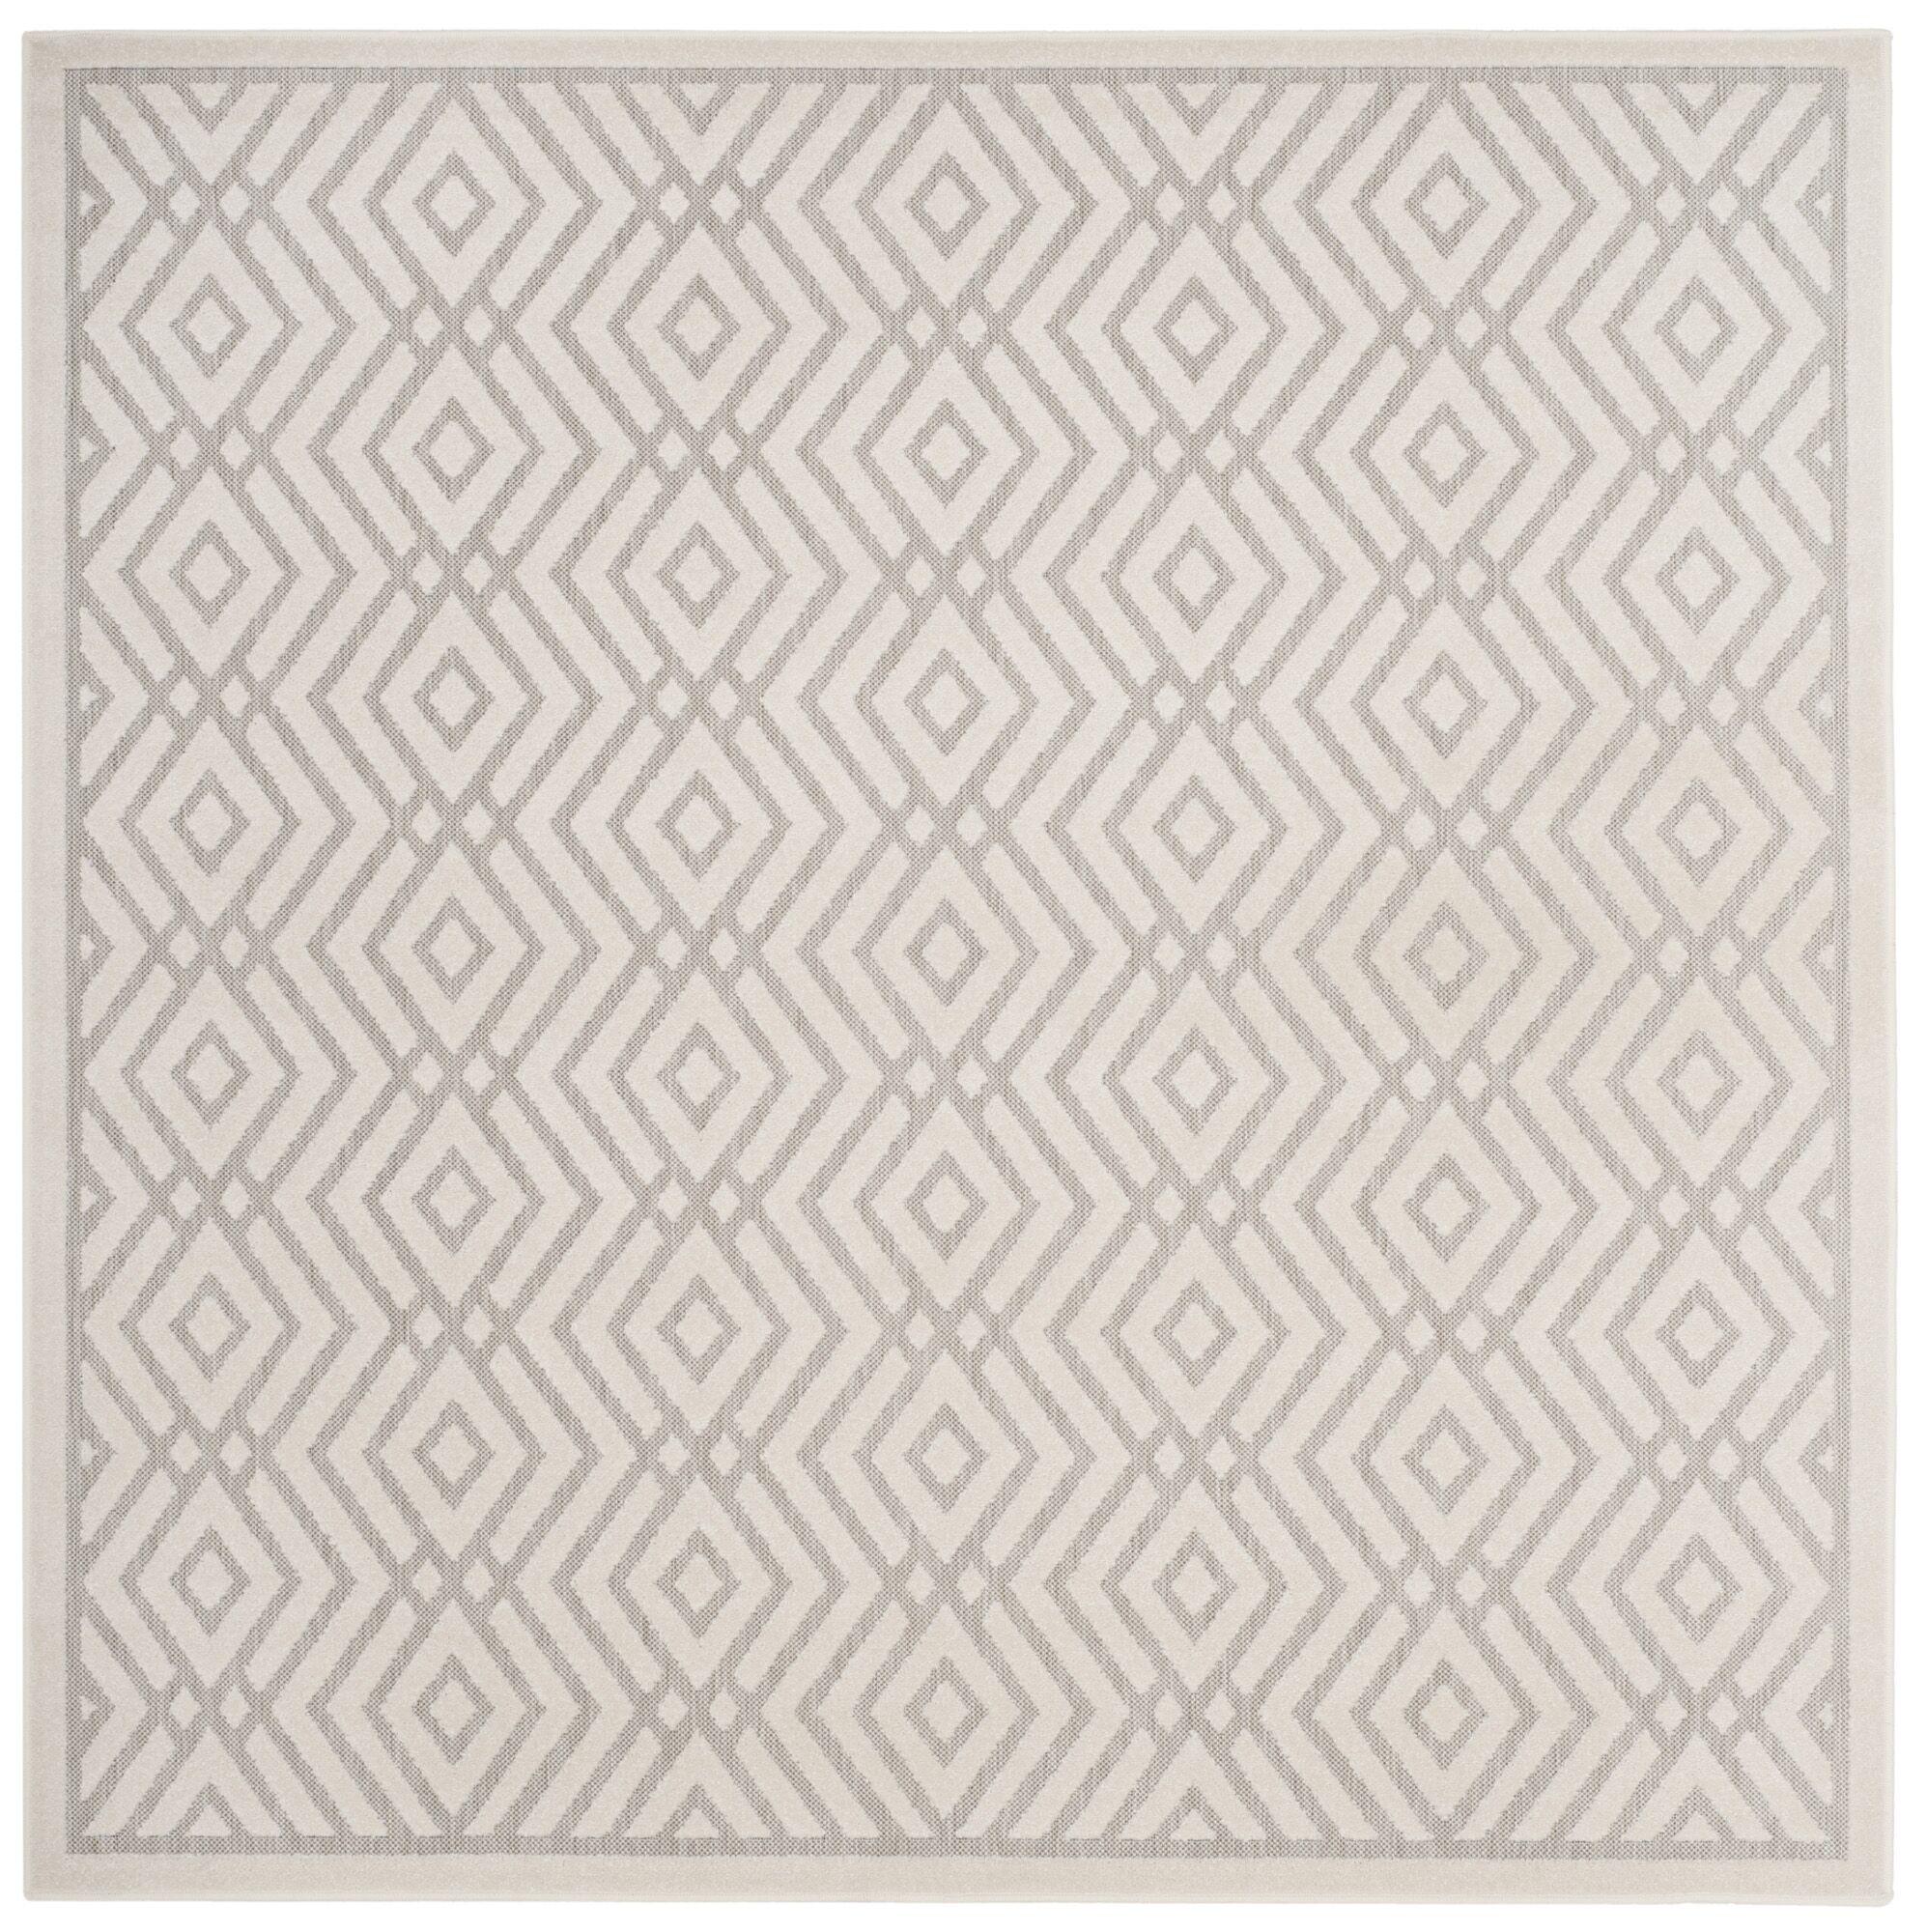 Cabana Light Gray/Cream Indoor/Outdoor Area Rug Rug Size: Square 6'7